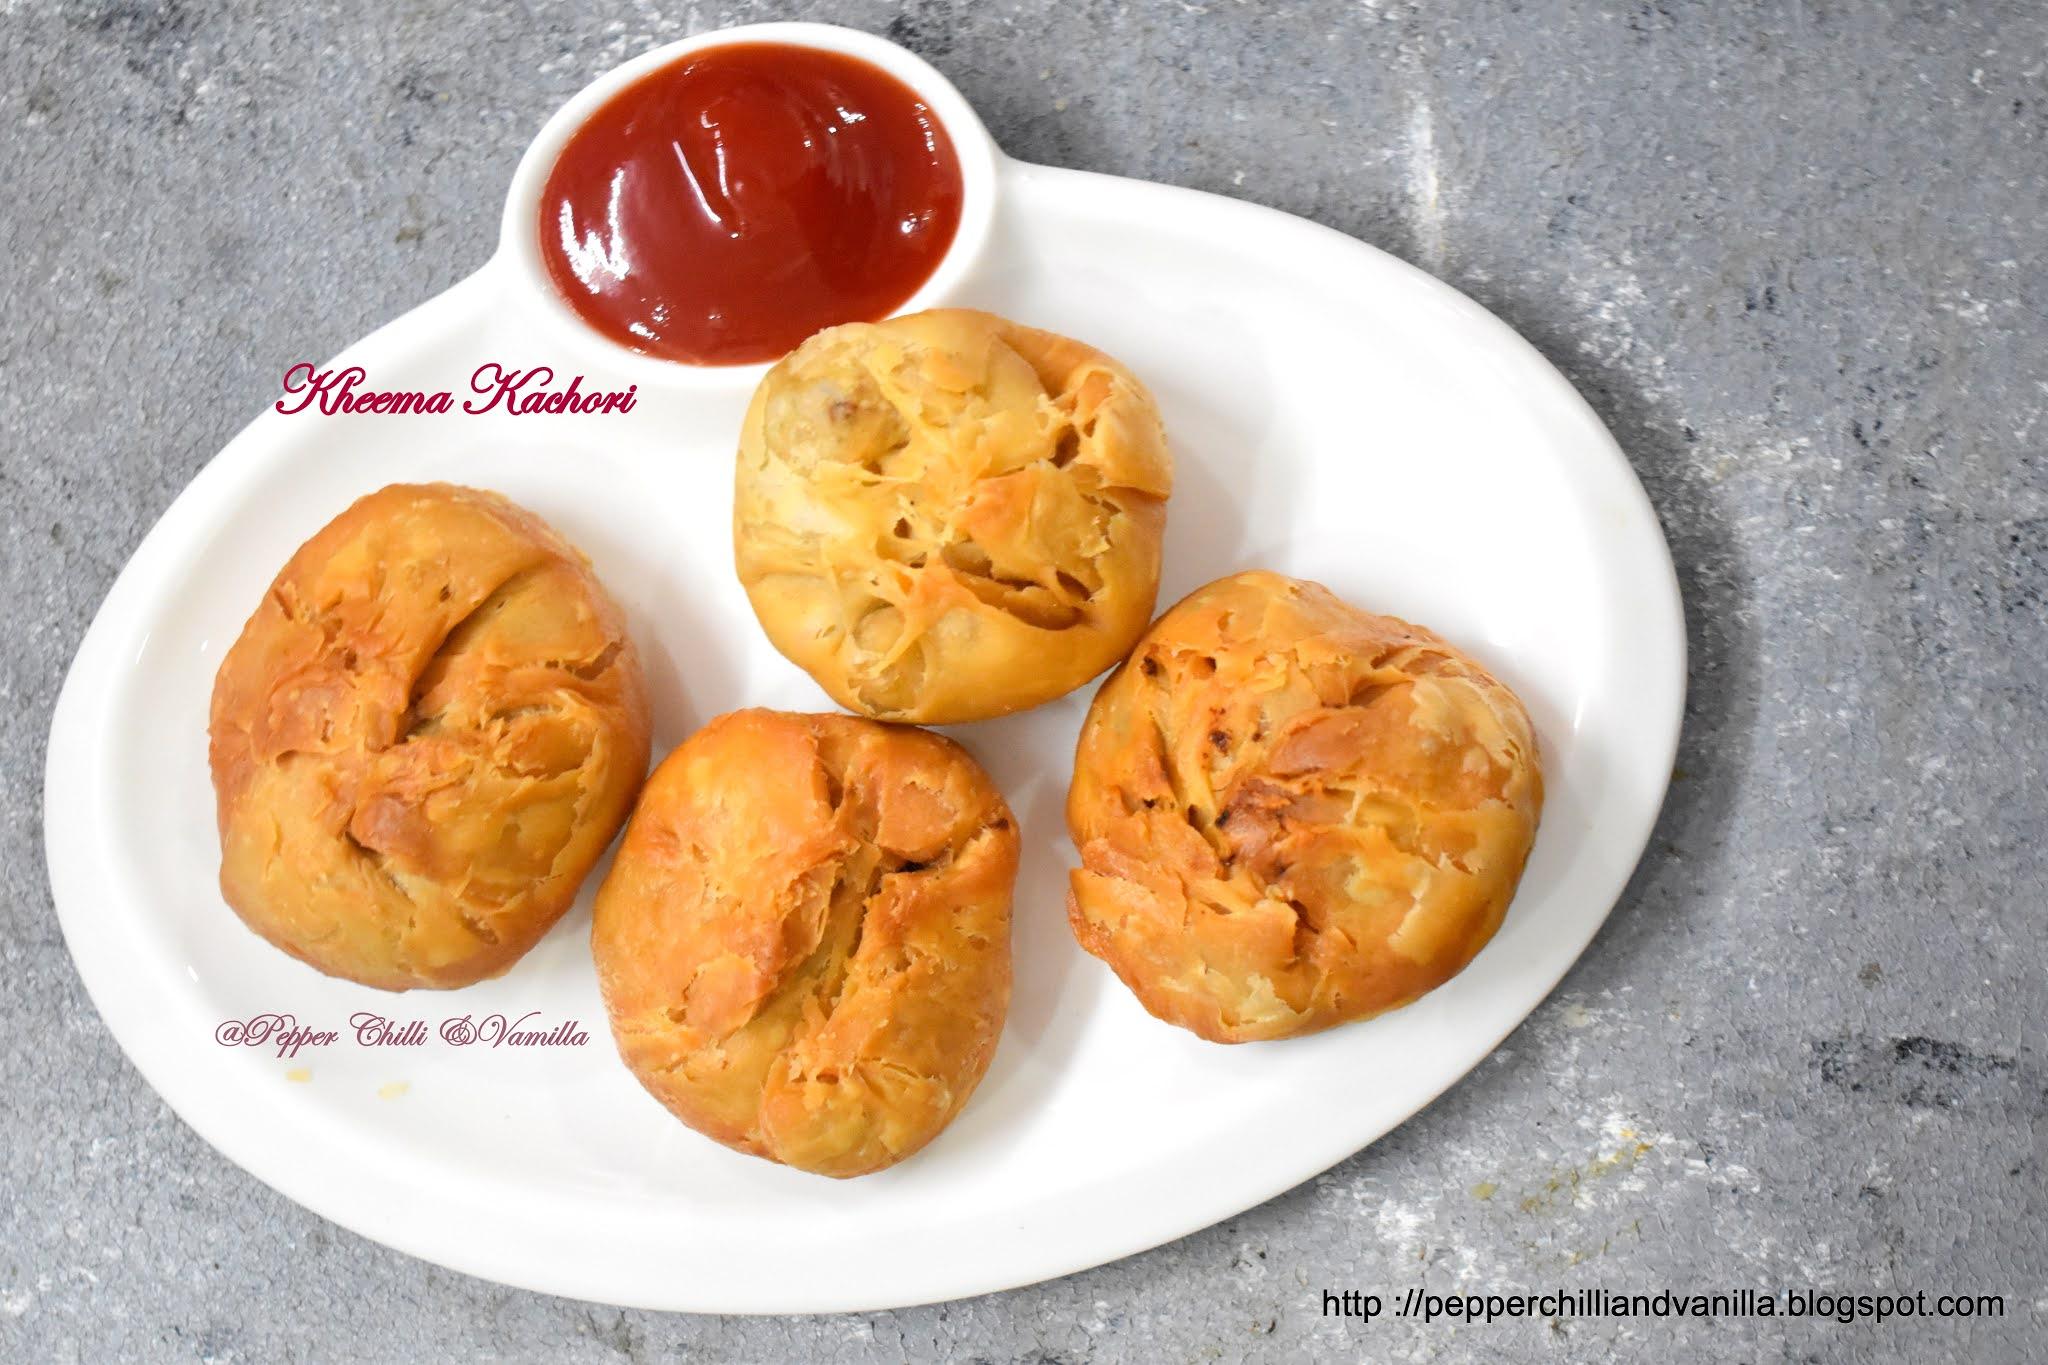 how to make keema kachori ,best easy khasta kheema kachori,best keema kachori recipe